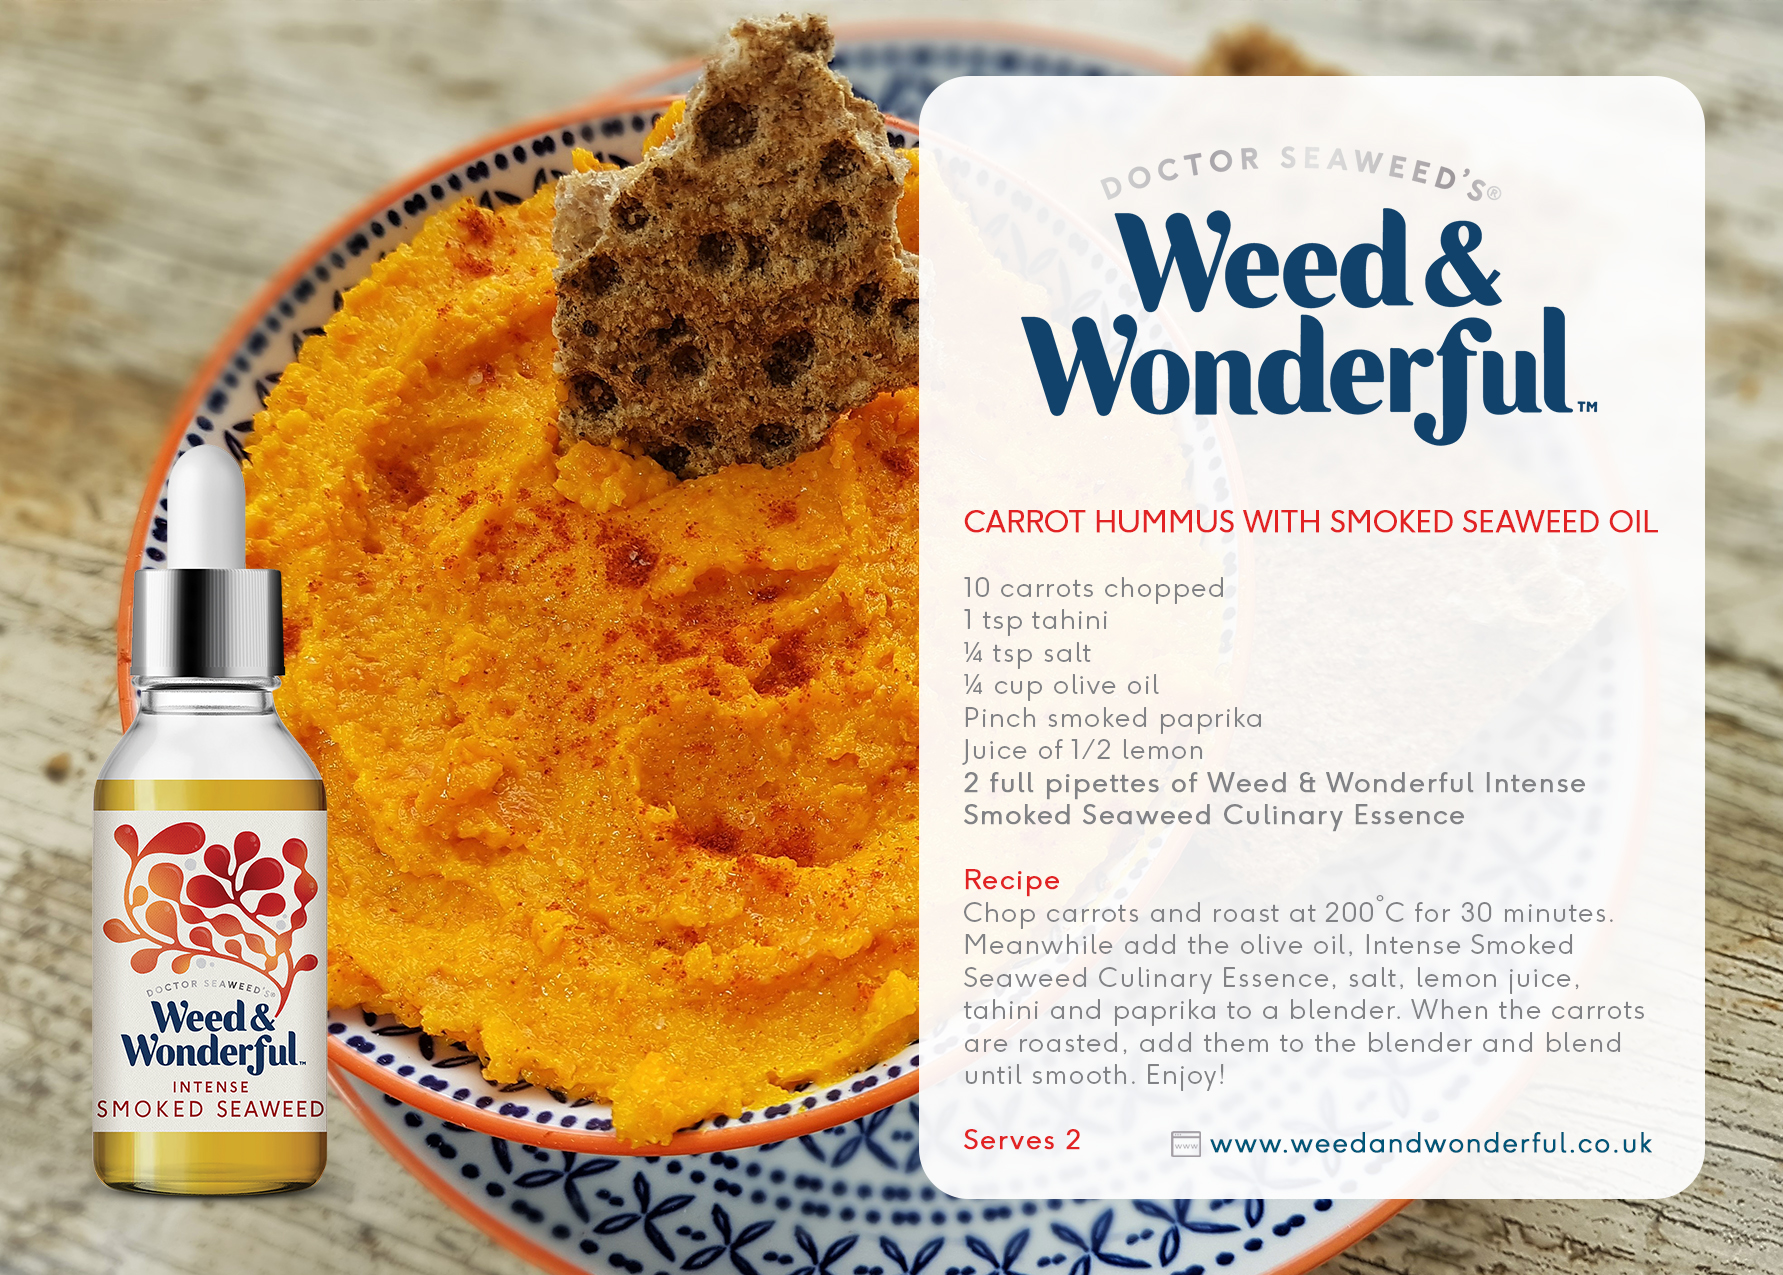 Intense Smoked Seaweed Culinary Essence 50ml